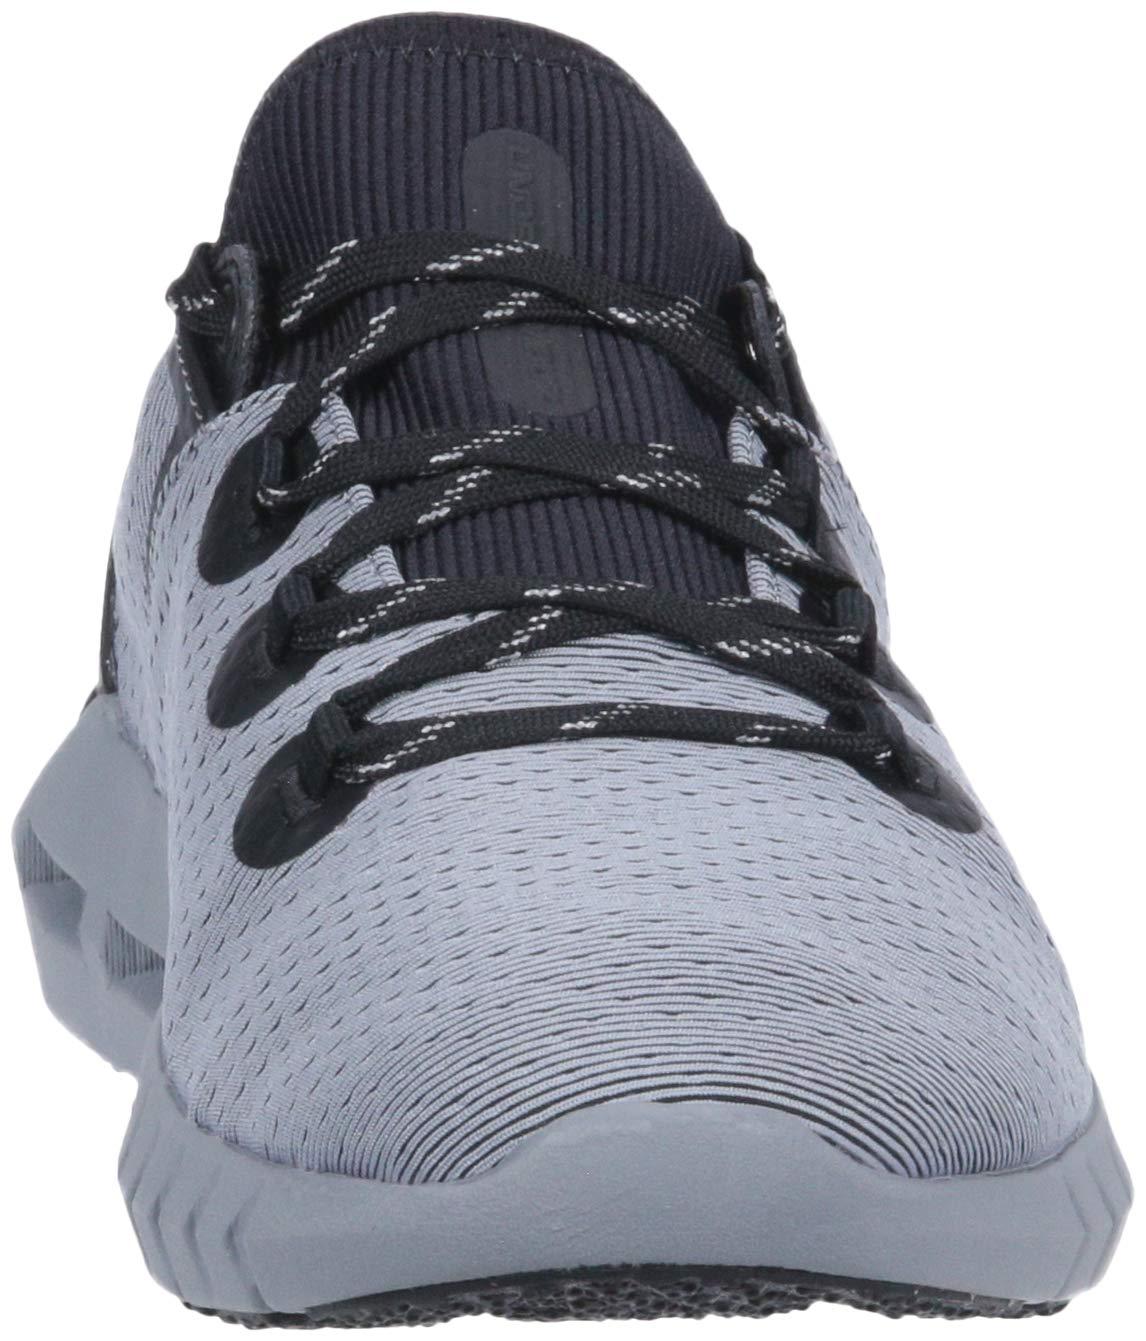 adidas Men's Questar BYD Running Shoe Black/Grey, 6.5 M US by adidas (Image #4)